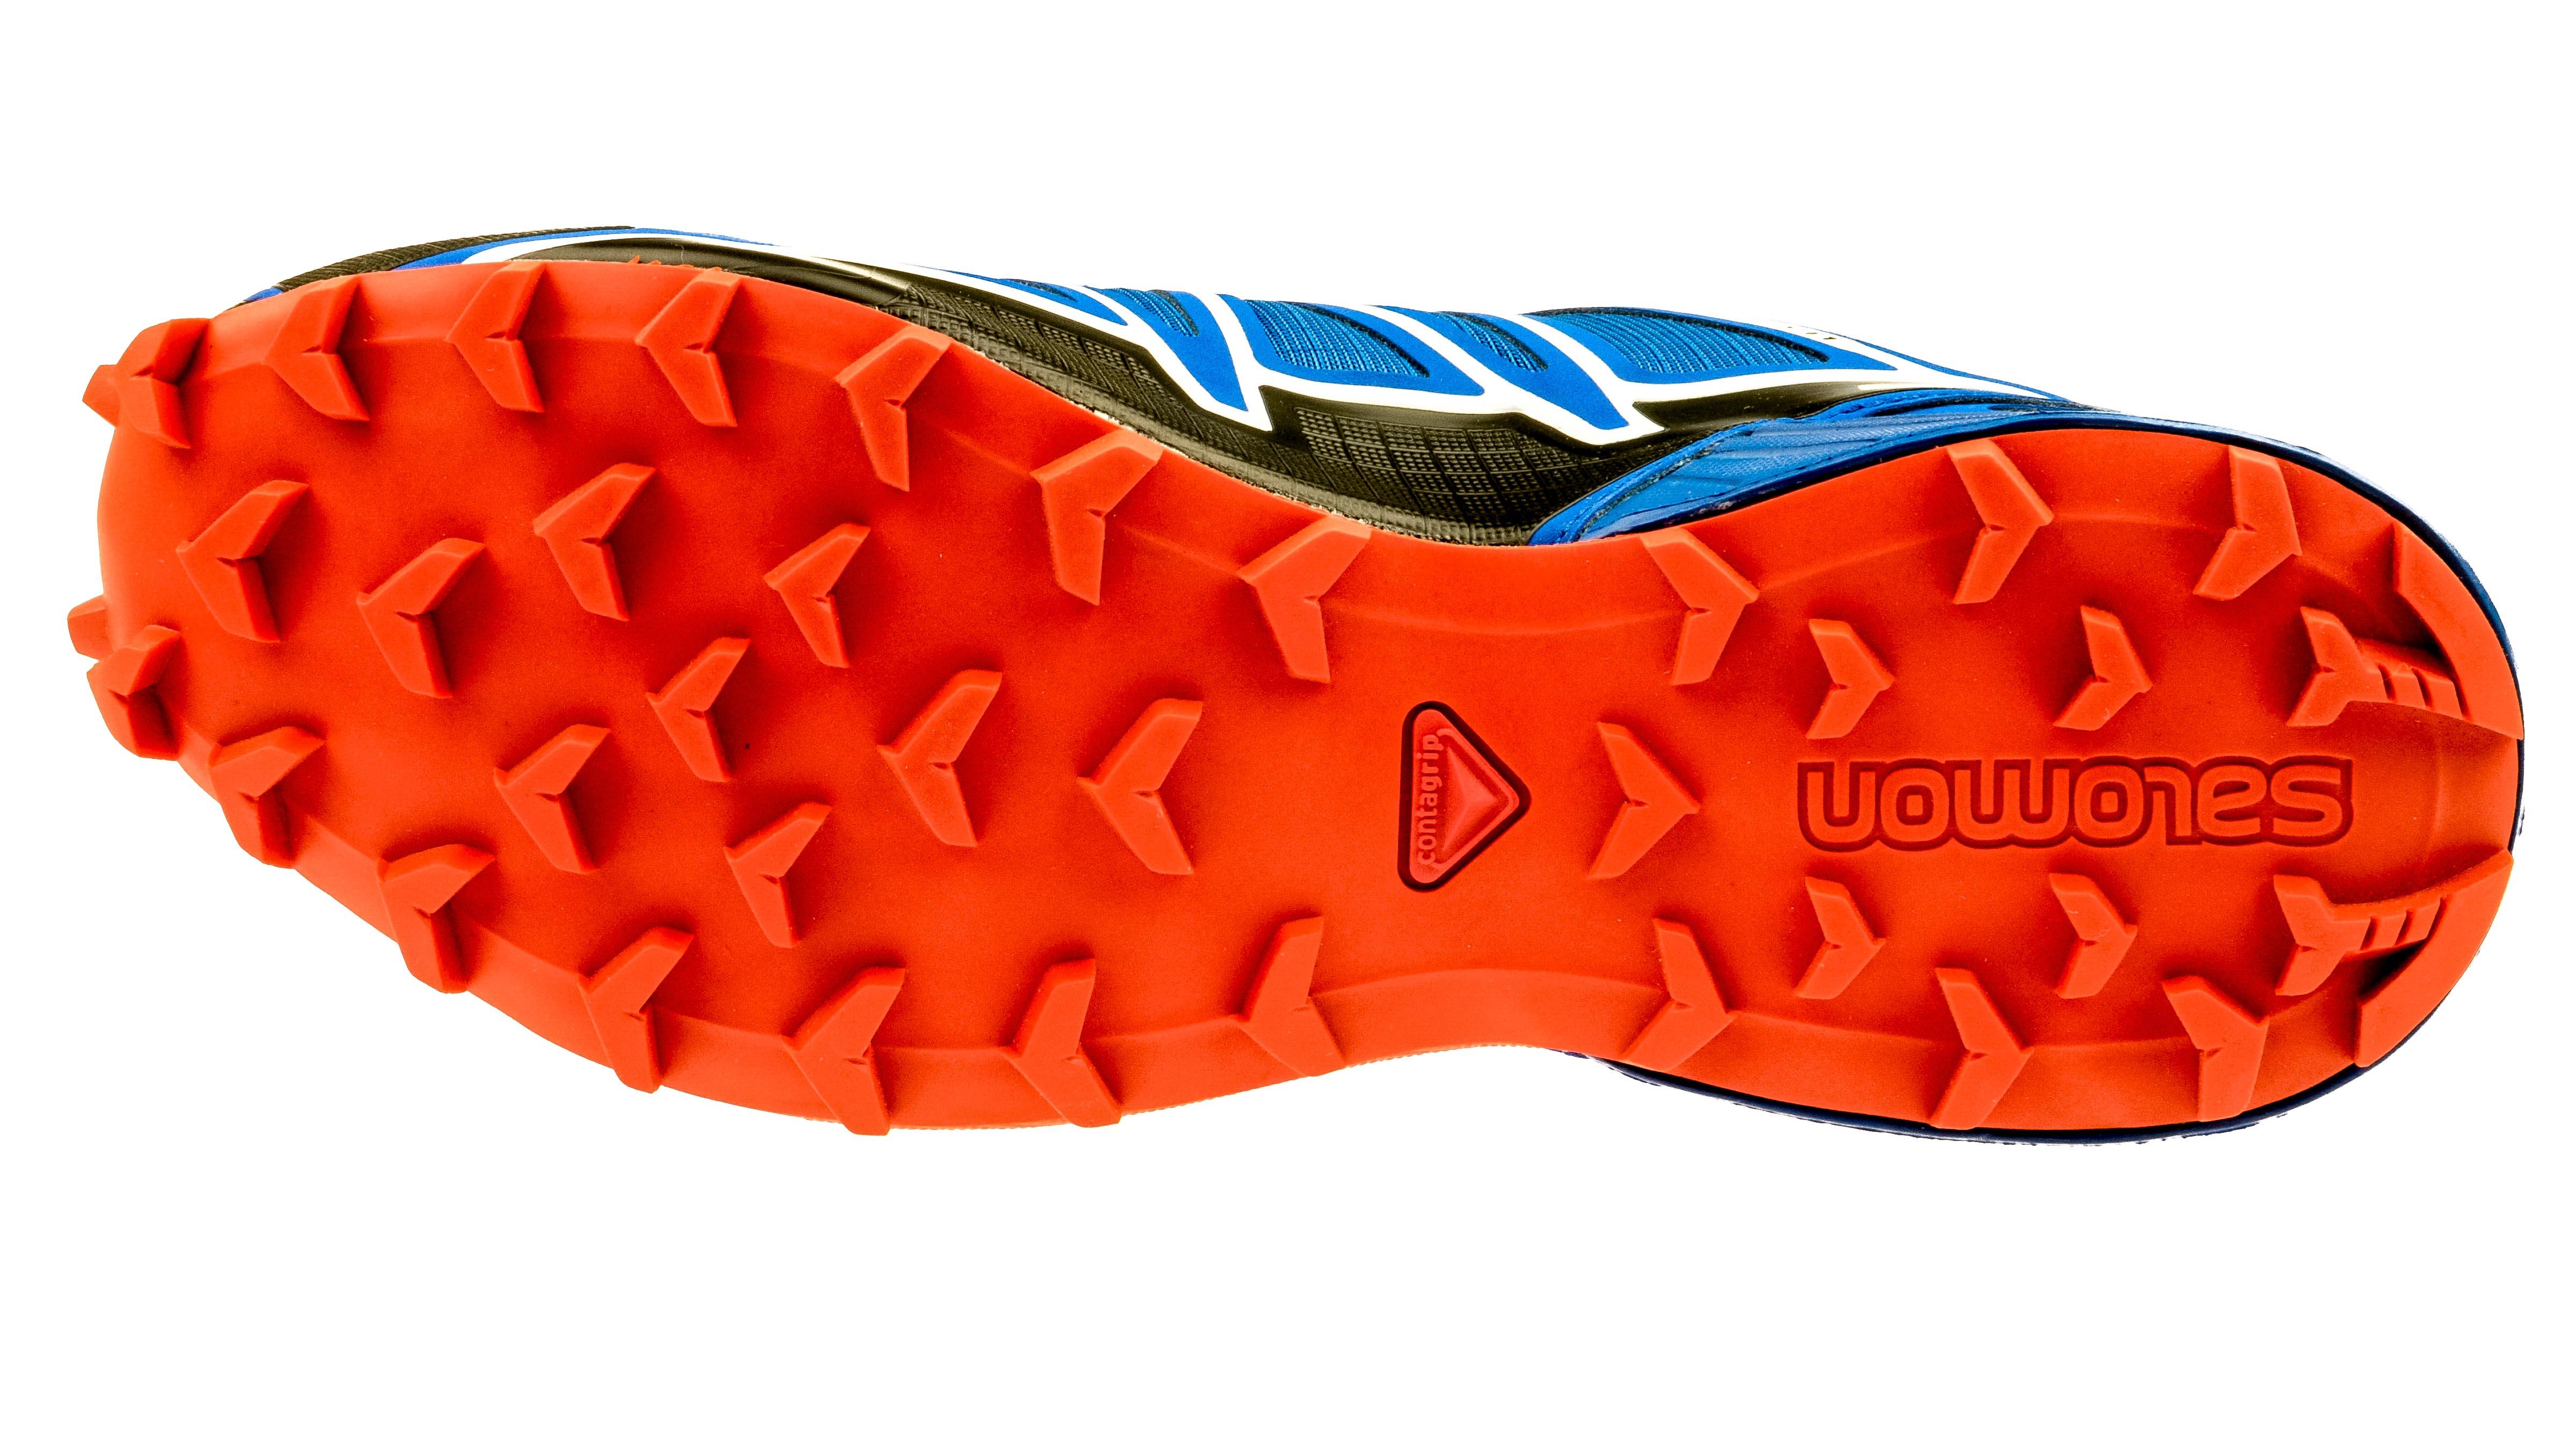 b8da3f35d0d Salomon Speedcross 4 Blue Yonder Black Lava Orange bestellen bij ...